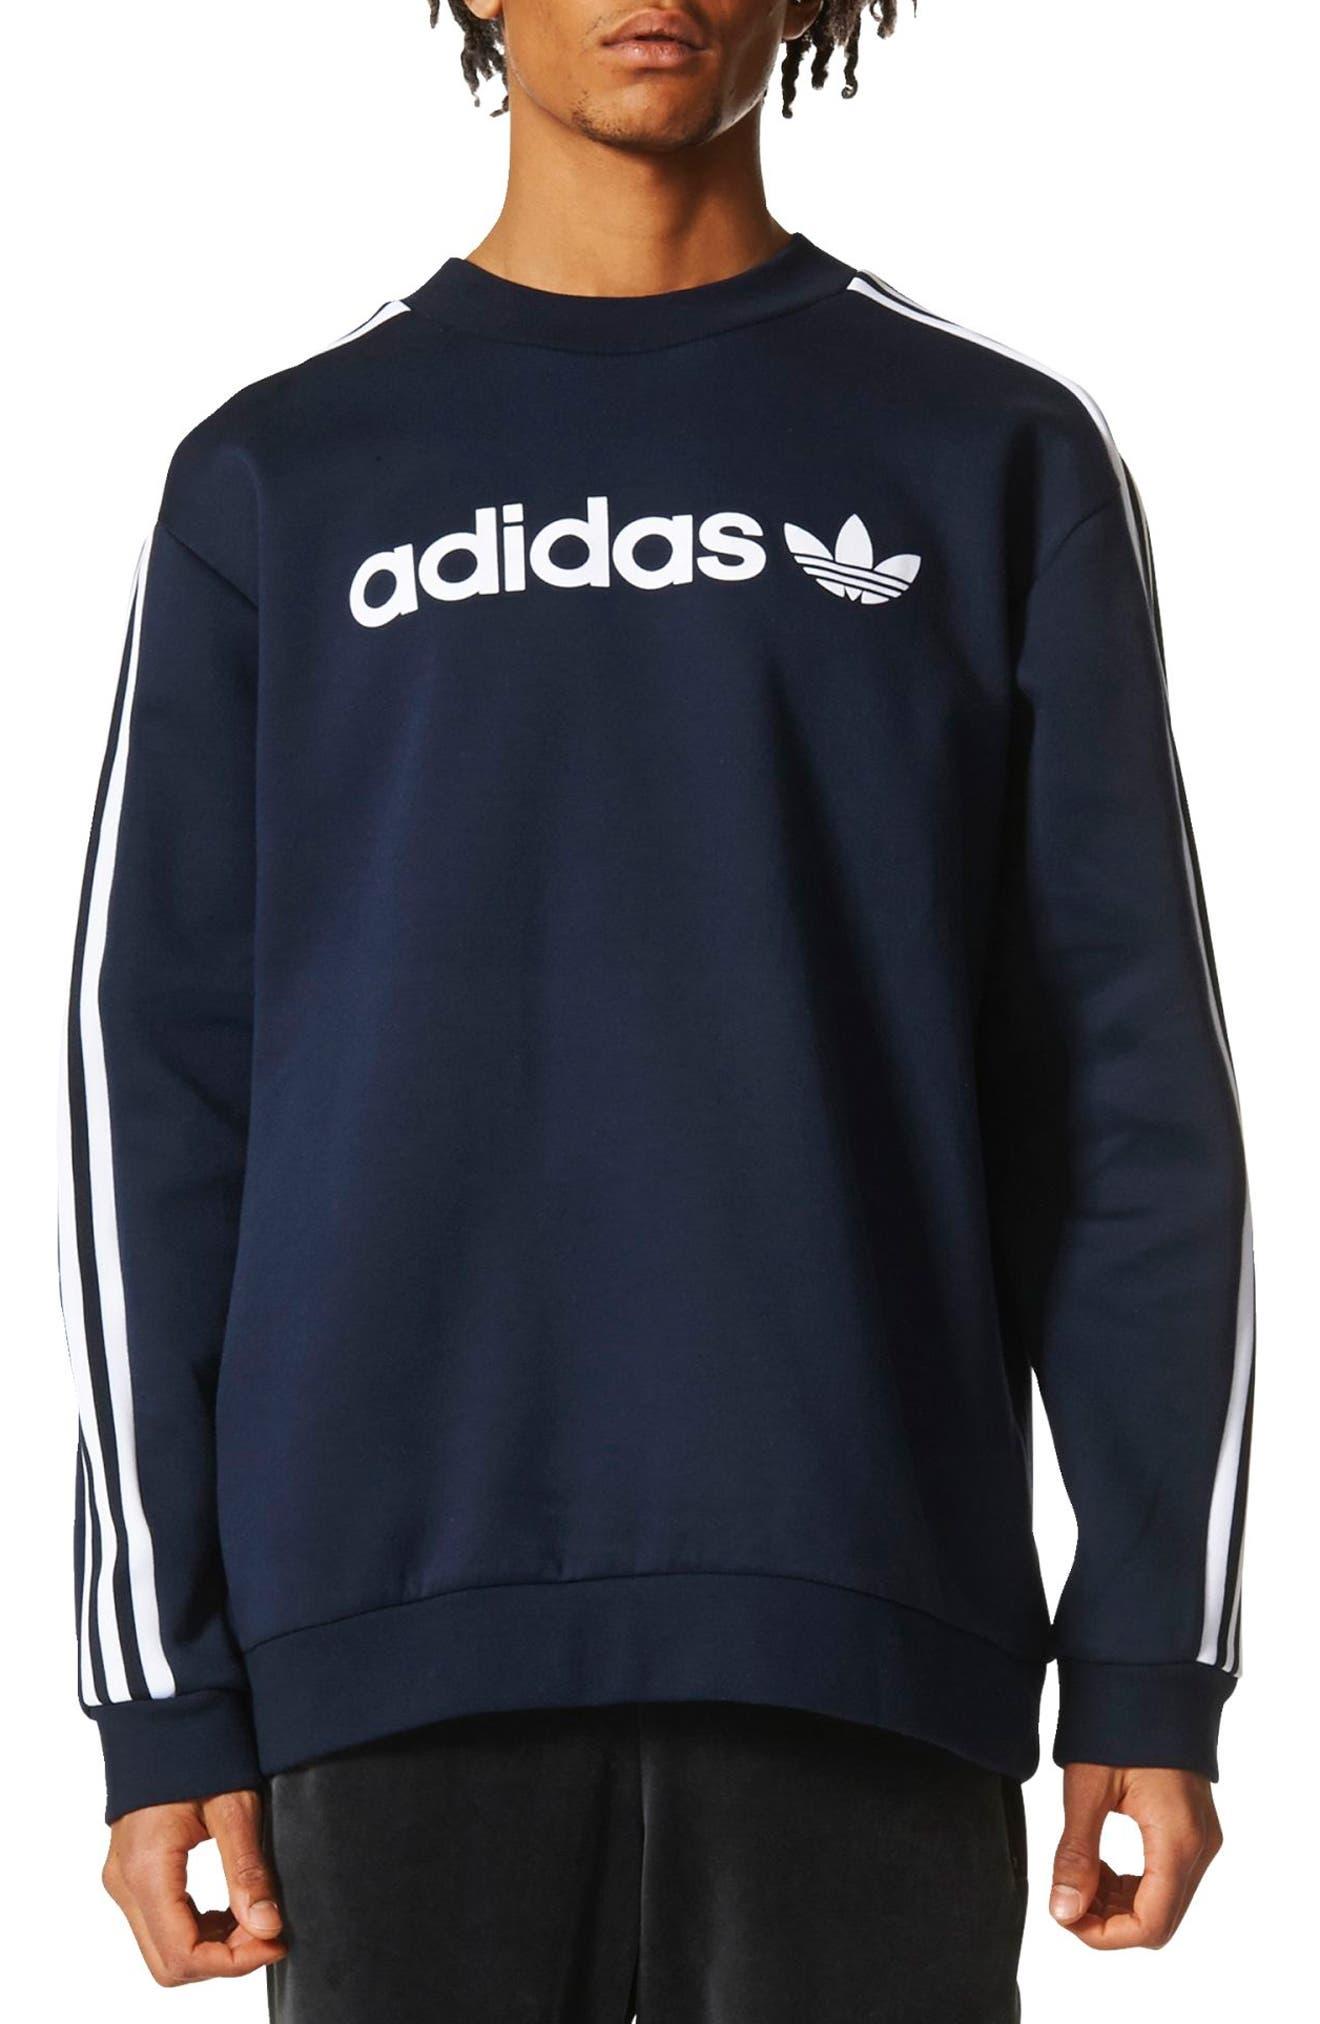 Main Image - adidas Originals Linear Graphic Sweatshirt